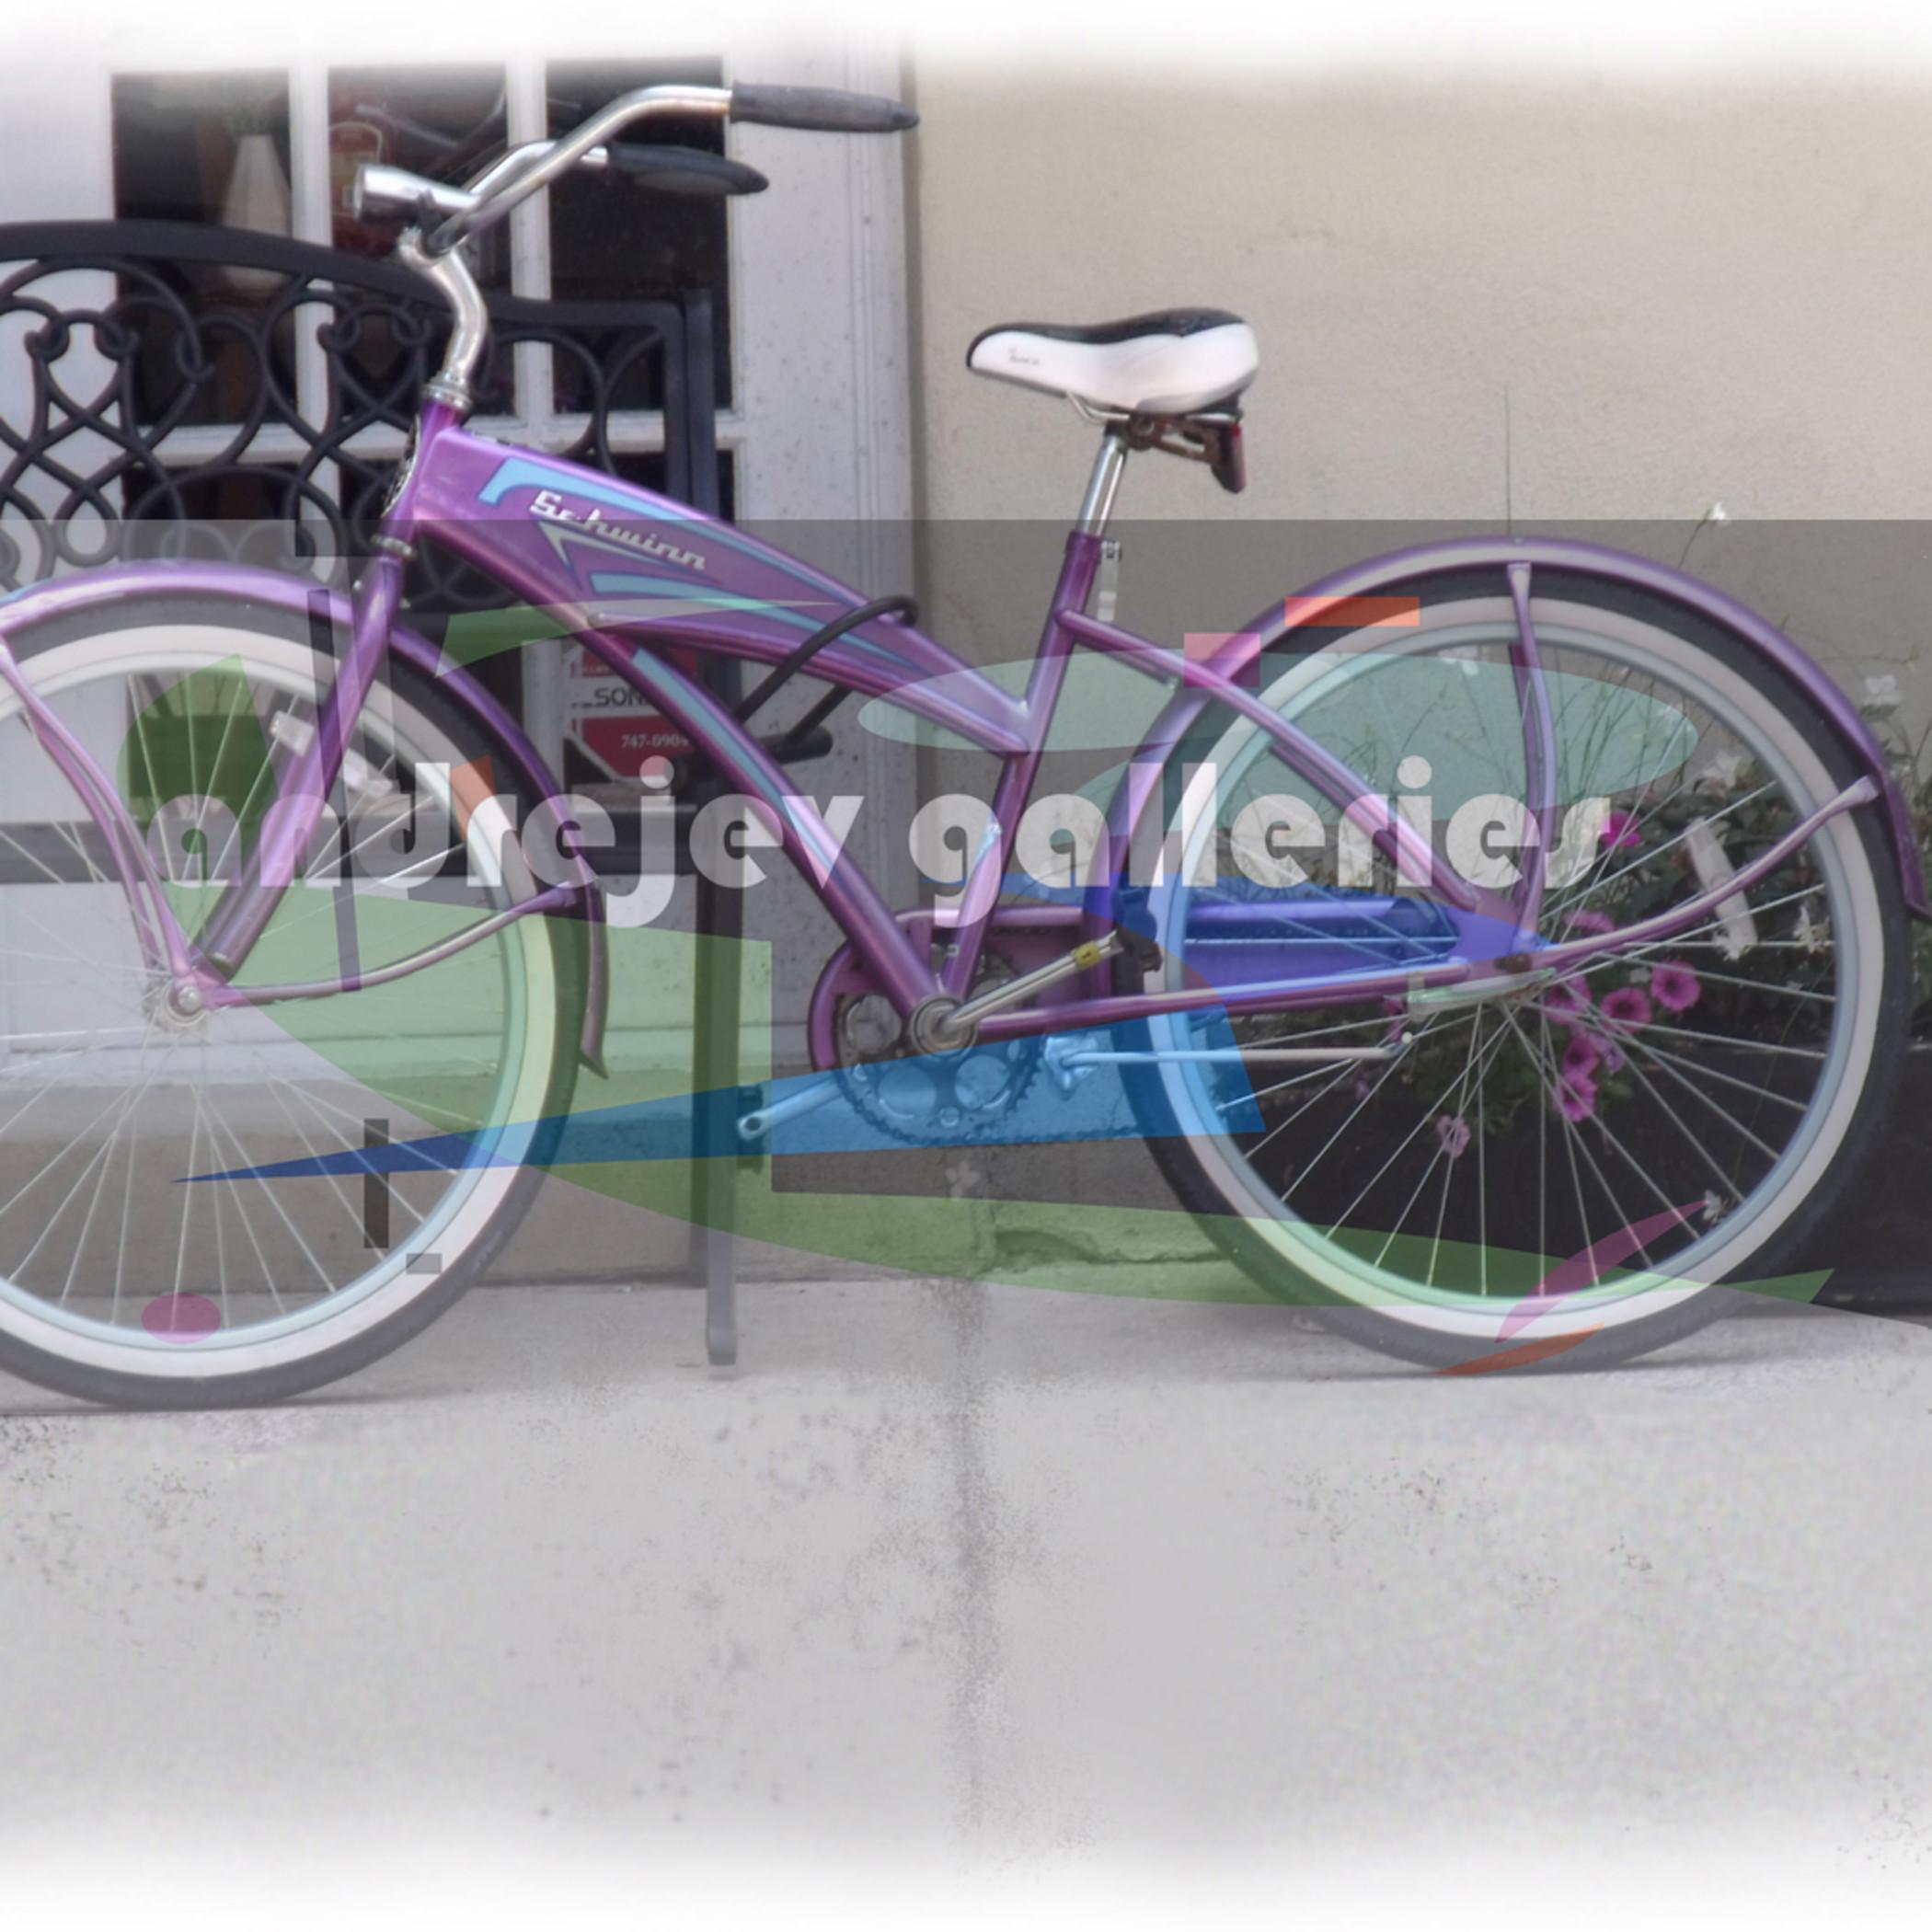 Bike ext hudy6g